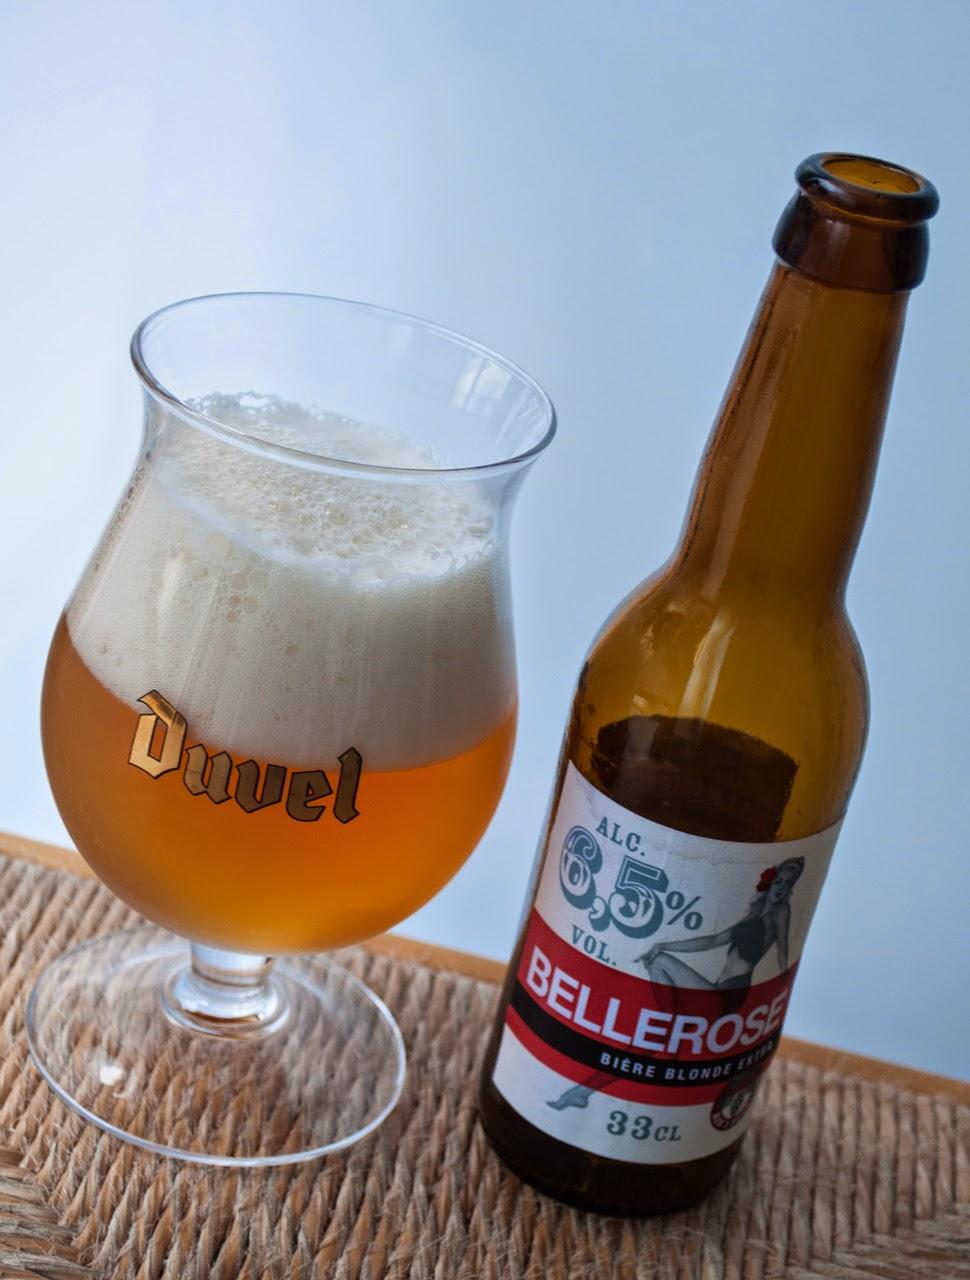 Bellerose Bière Blonde Extra